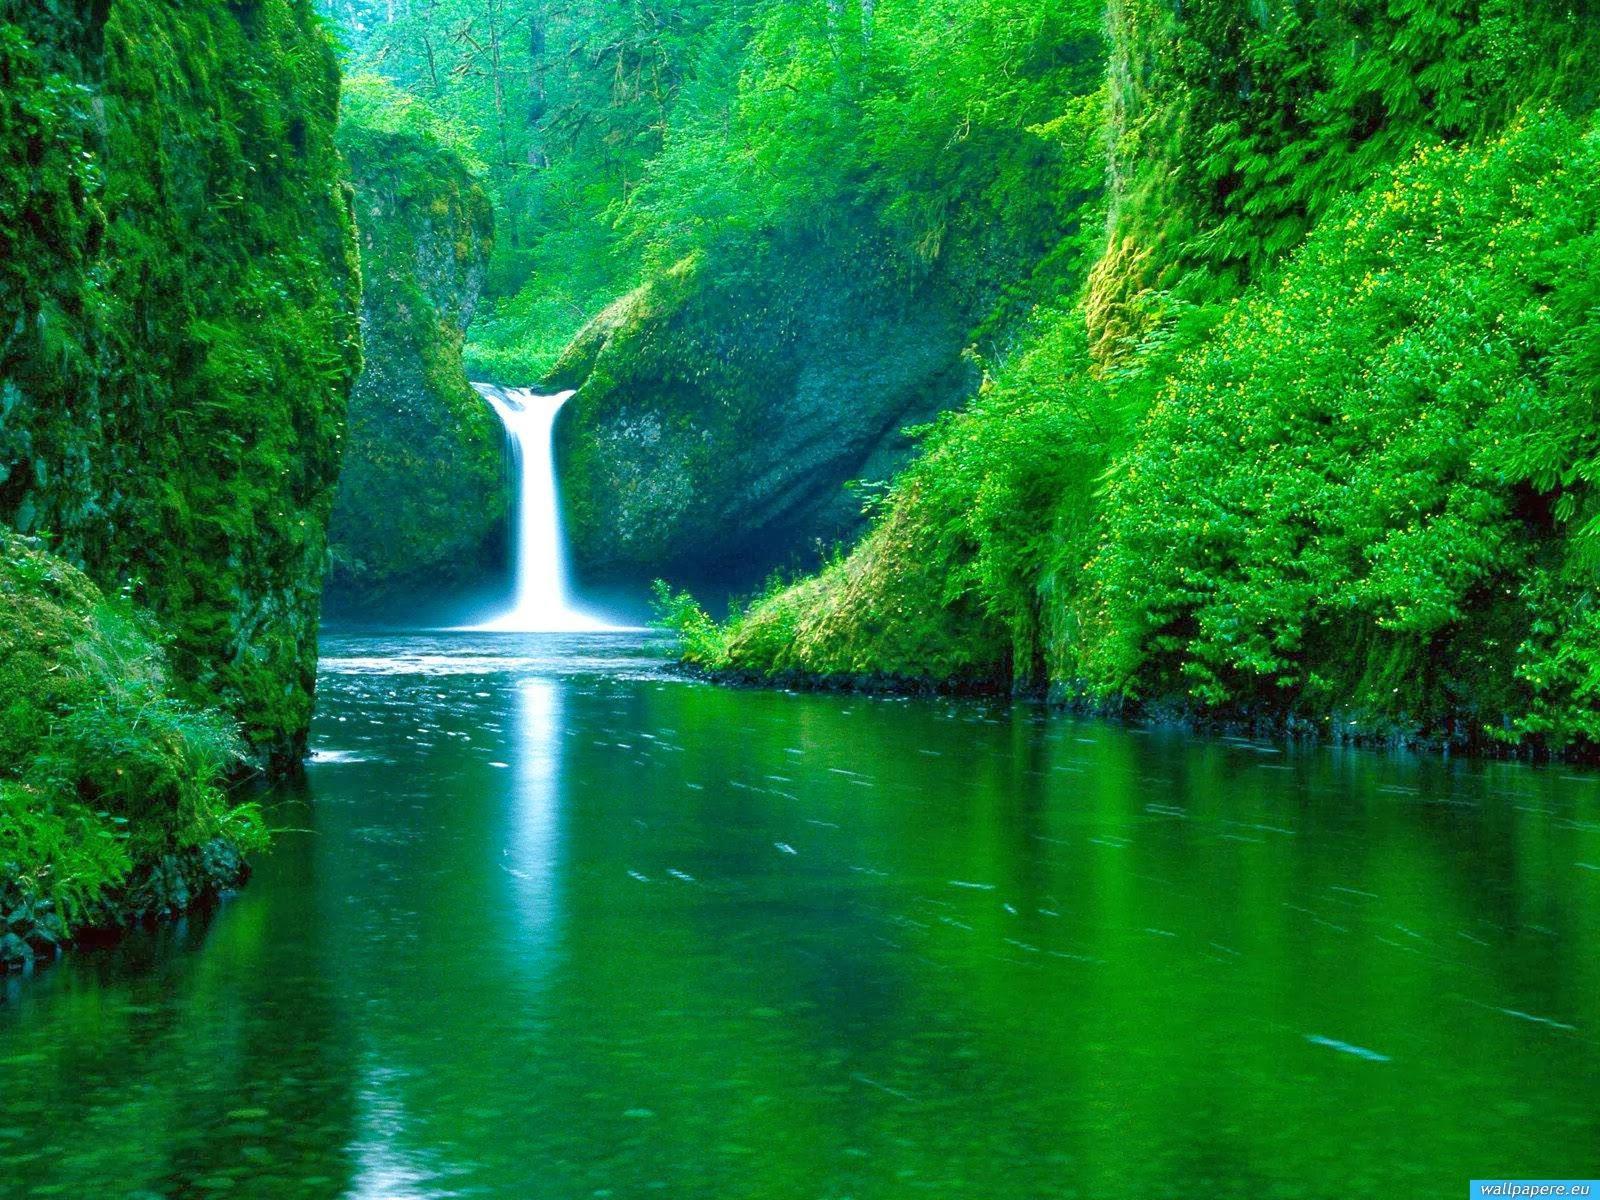 Beautiful+wallpapers+of+nature+for+desktop+free+download.